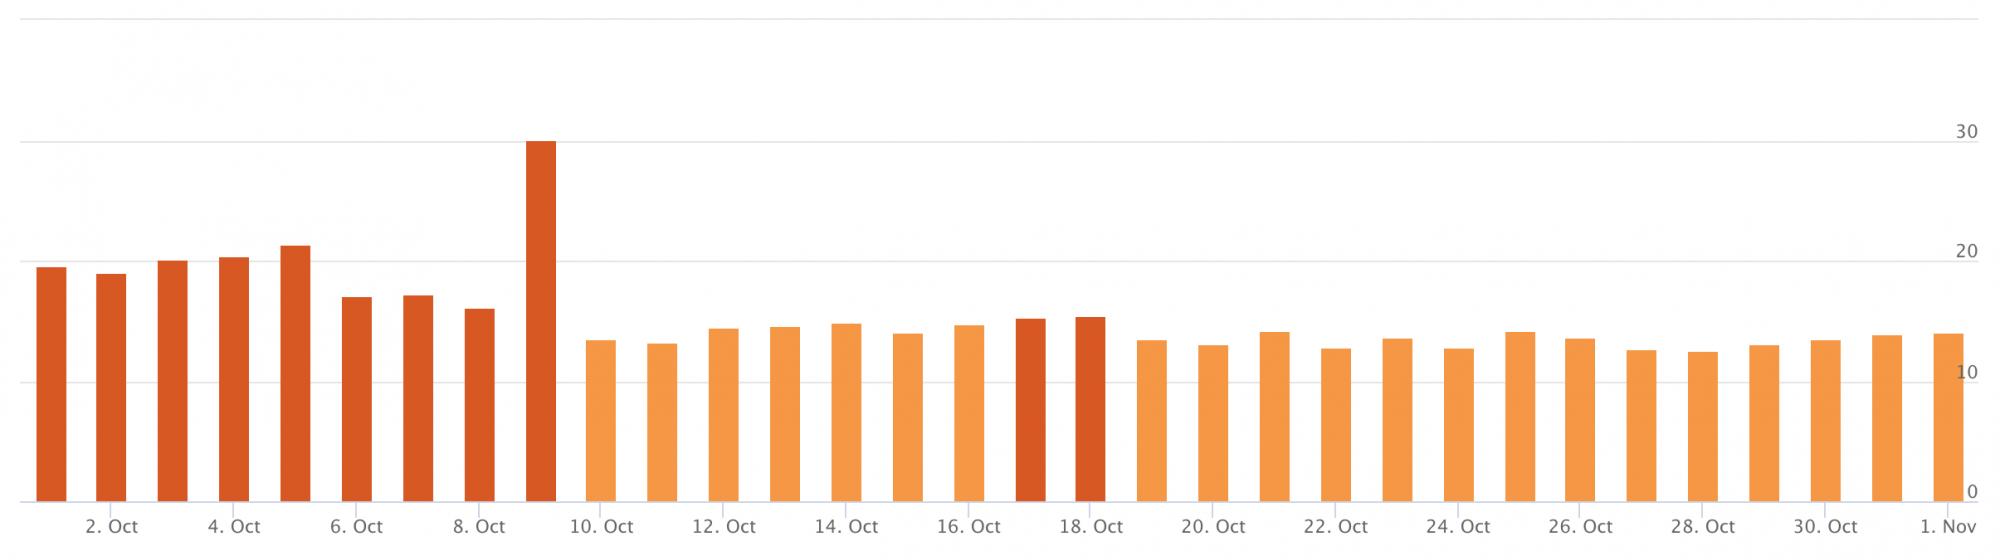 Google Halloween Ranking Update: Possible Niche Update Yesterday